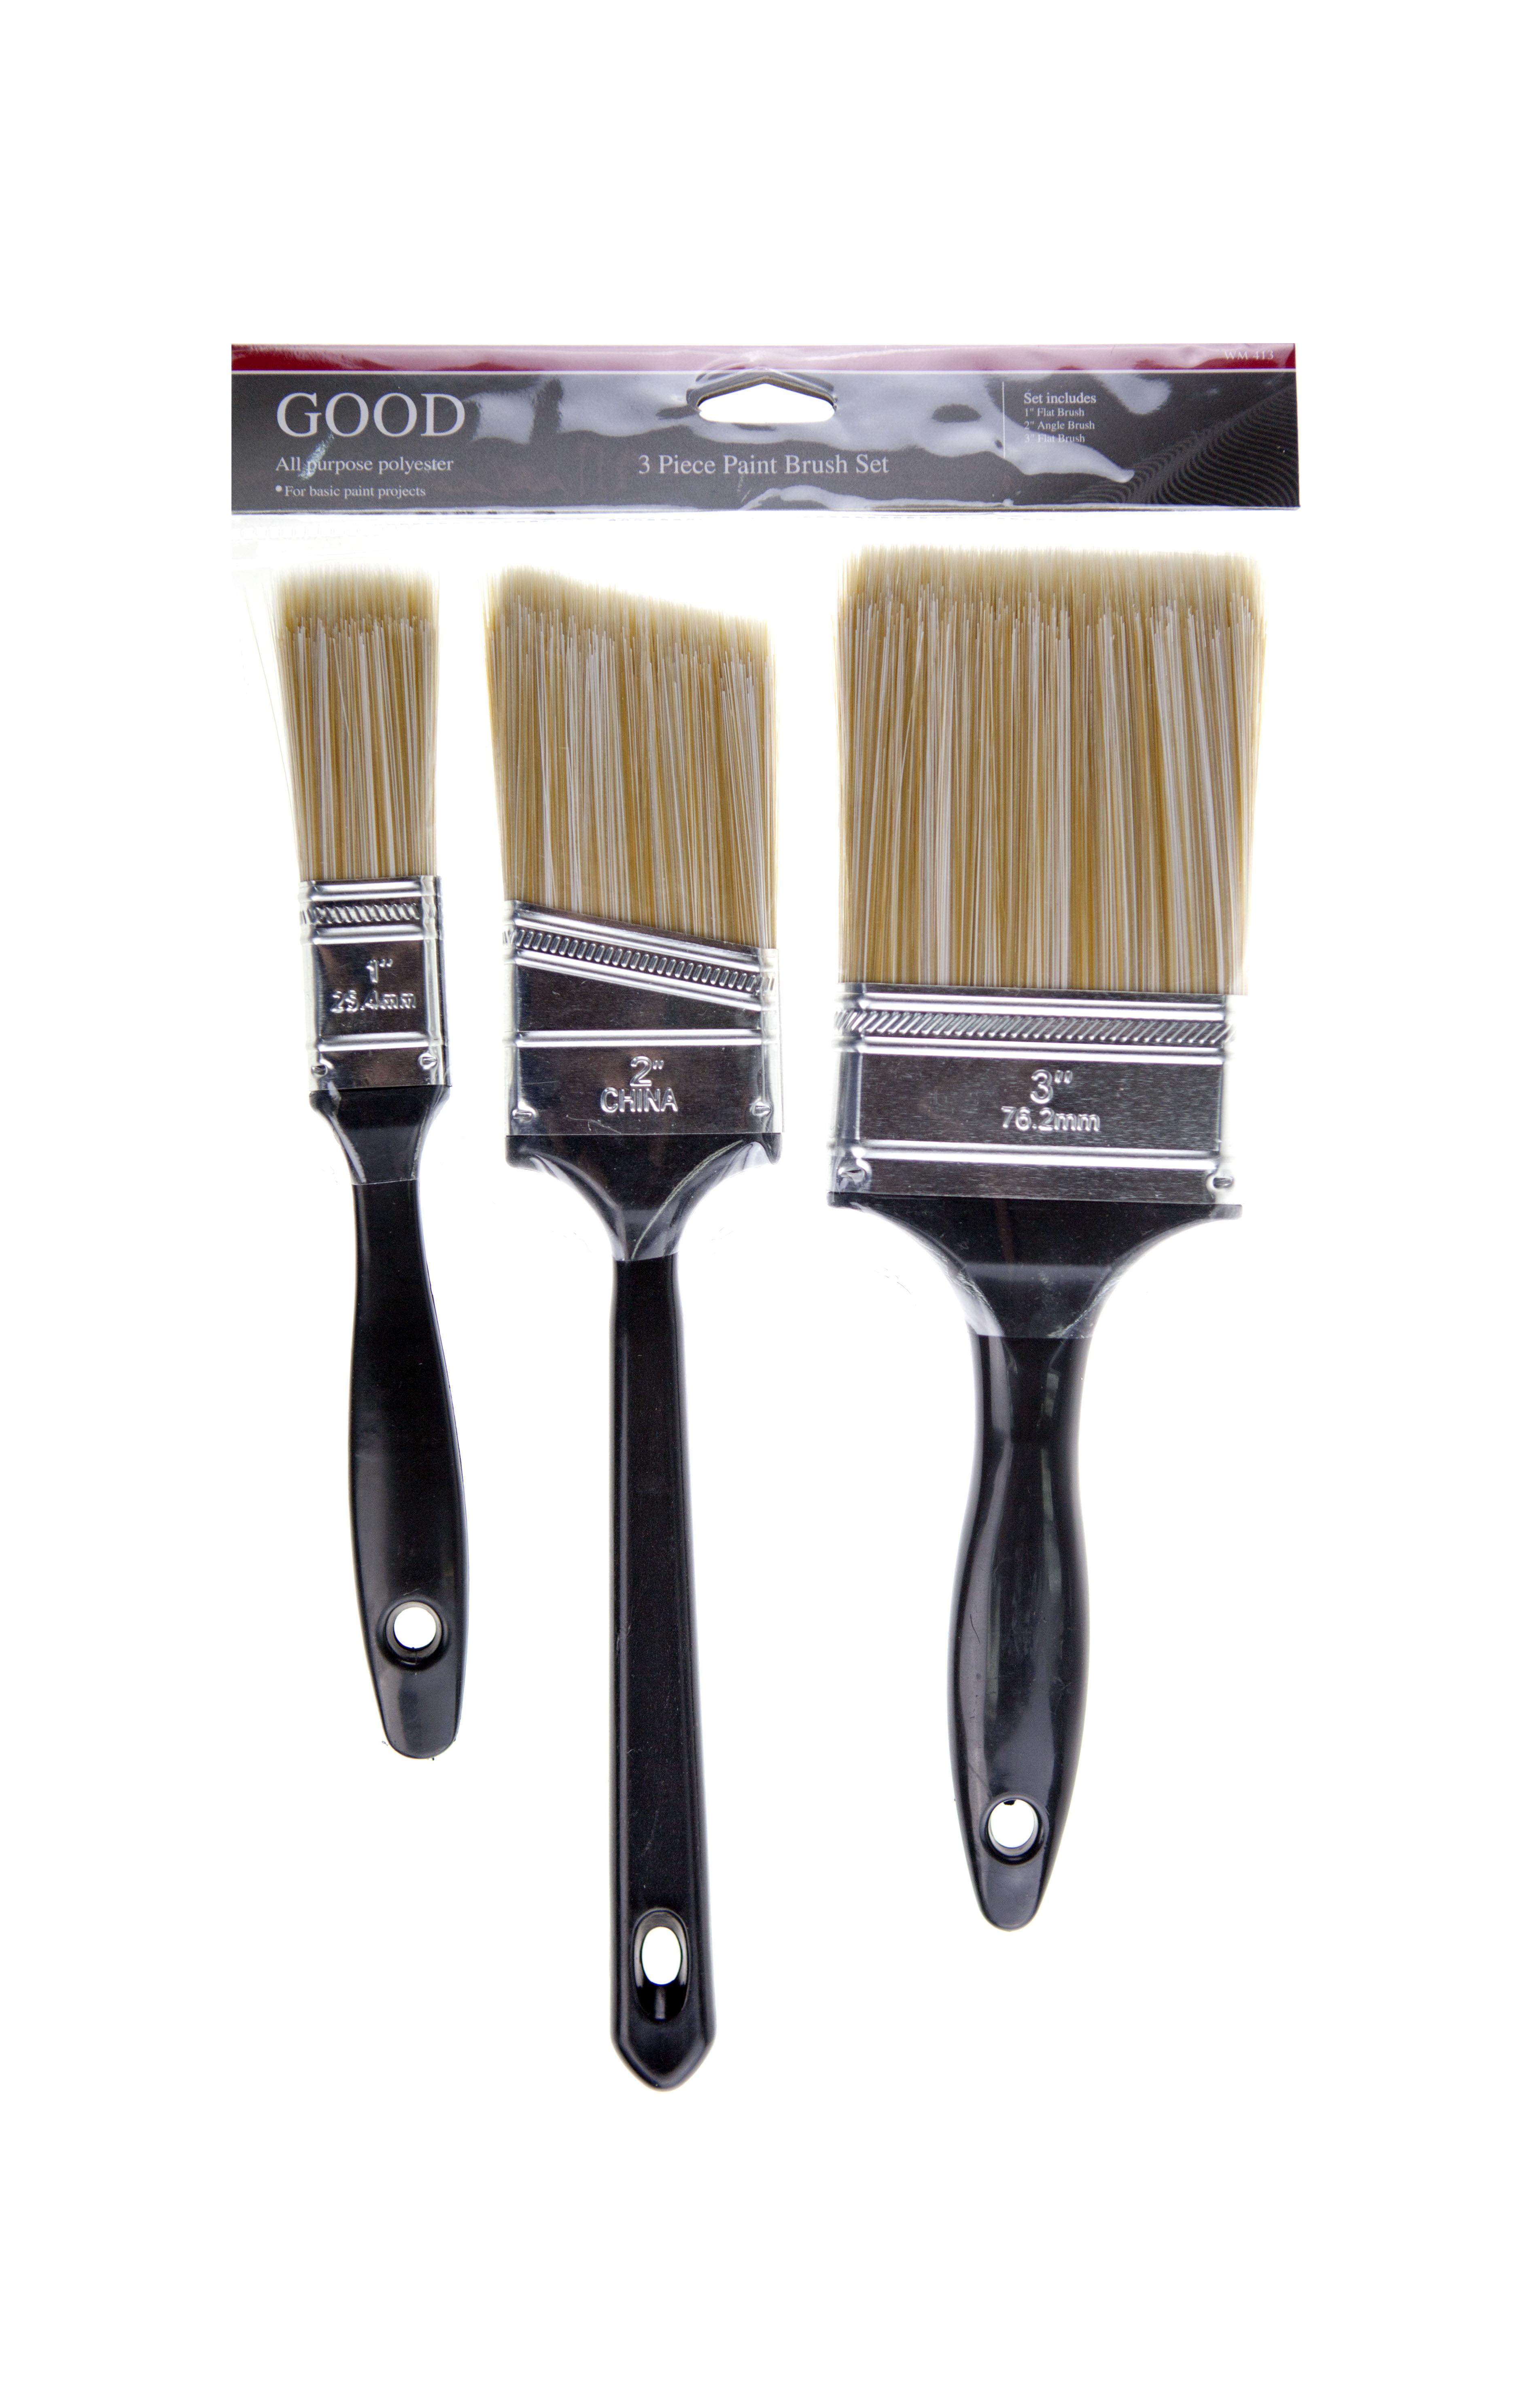 3pcs Good Brushs Set by Zhejiang G&F Foreign Trading Co., Ltd.